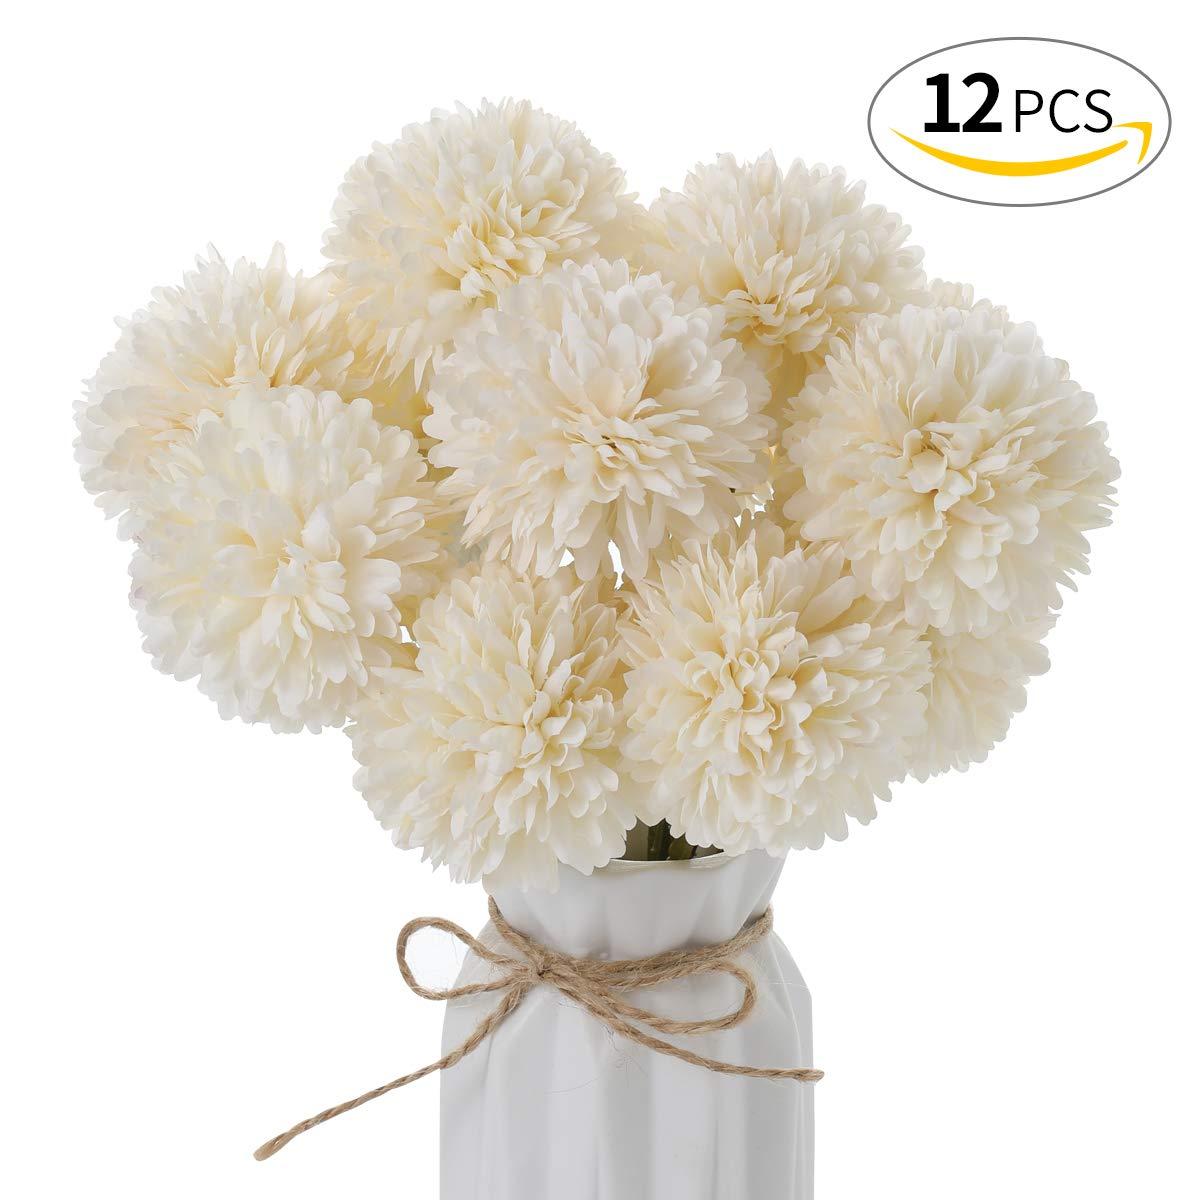 Anndason 造花 シルク製 造花 ウェディングパーティー ホームデコレーション 12個 ASW34 B07QCXLK8C ホワイト